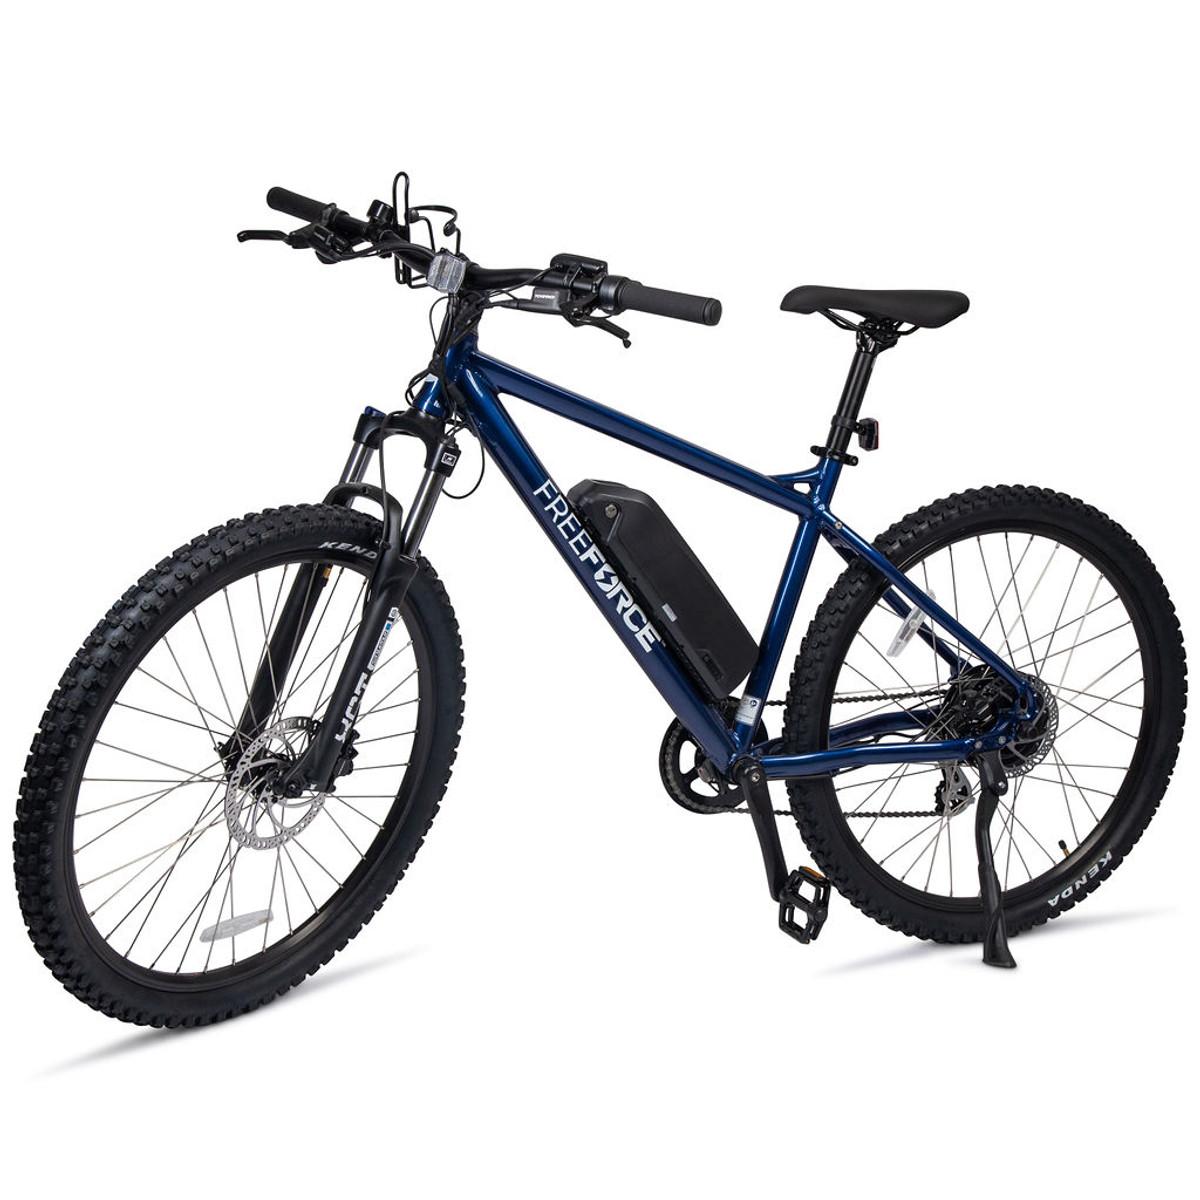 "The Denver Electric Mountain Bike - Navy 20"" Frame"